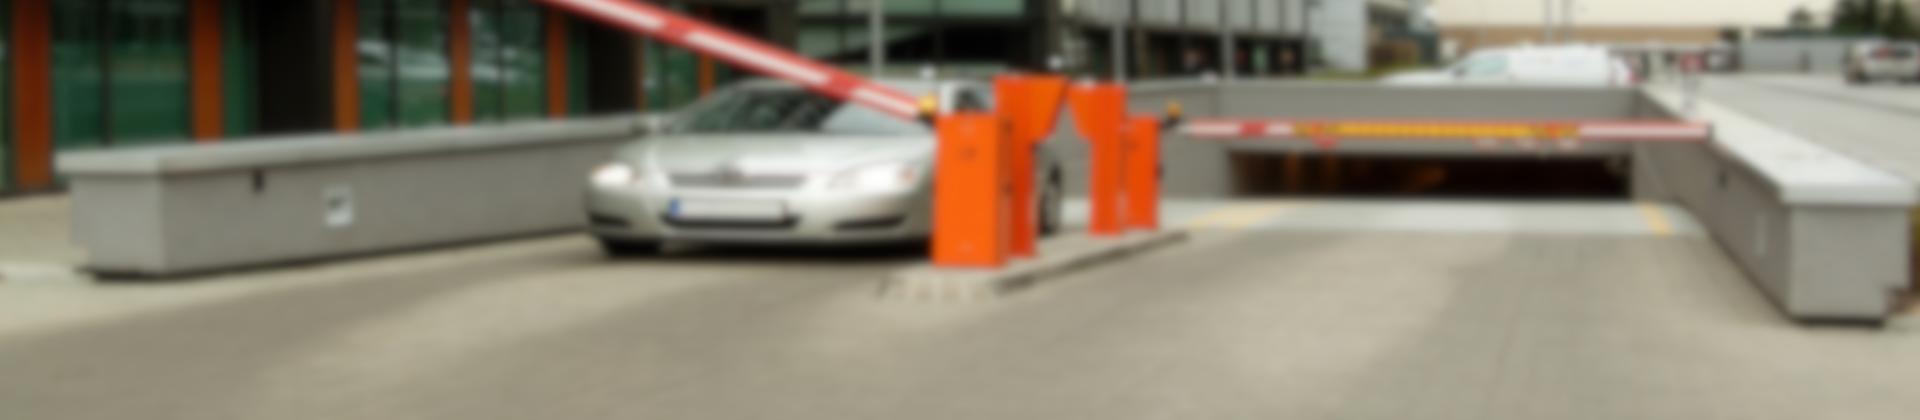 POLYCO SERVICE - szlabany, automatyka bram